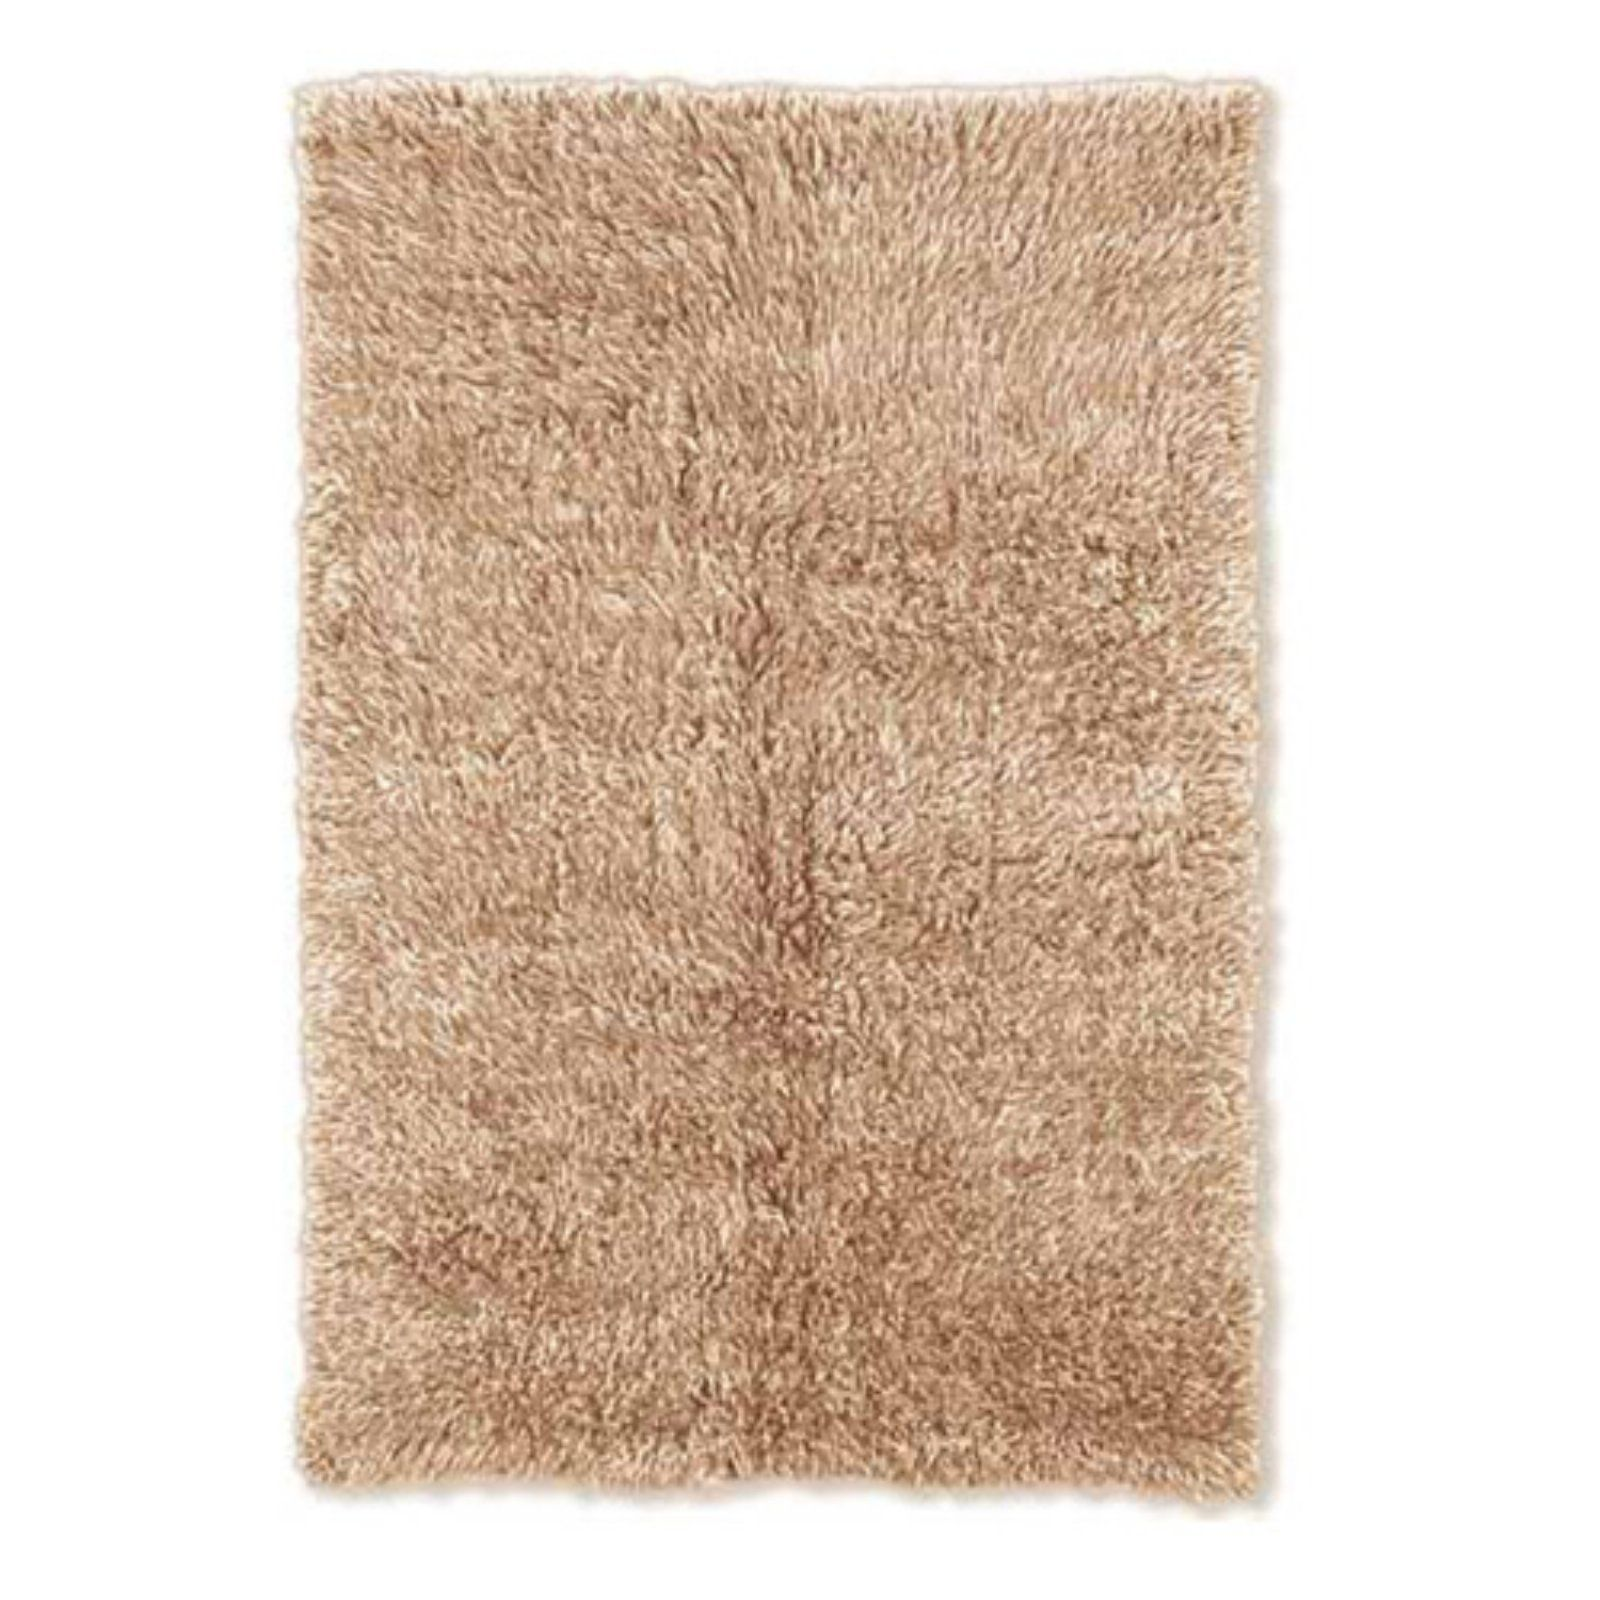 Linon Tan 3a Flokati Area Rug Size 9 X 12 Ft Tan Rug Flokati Rug Wool Rug